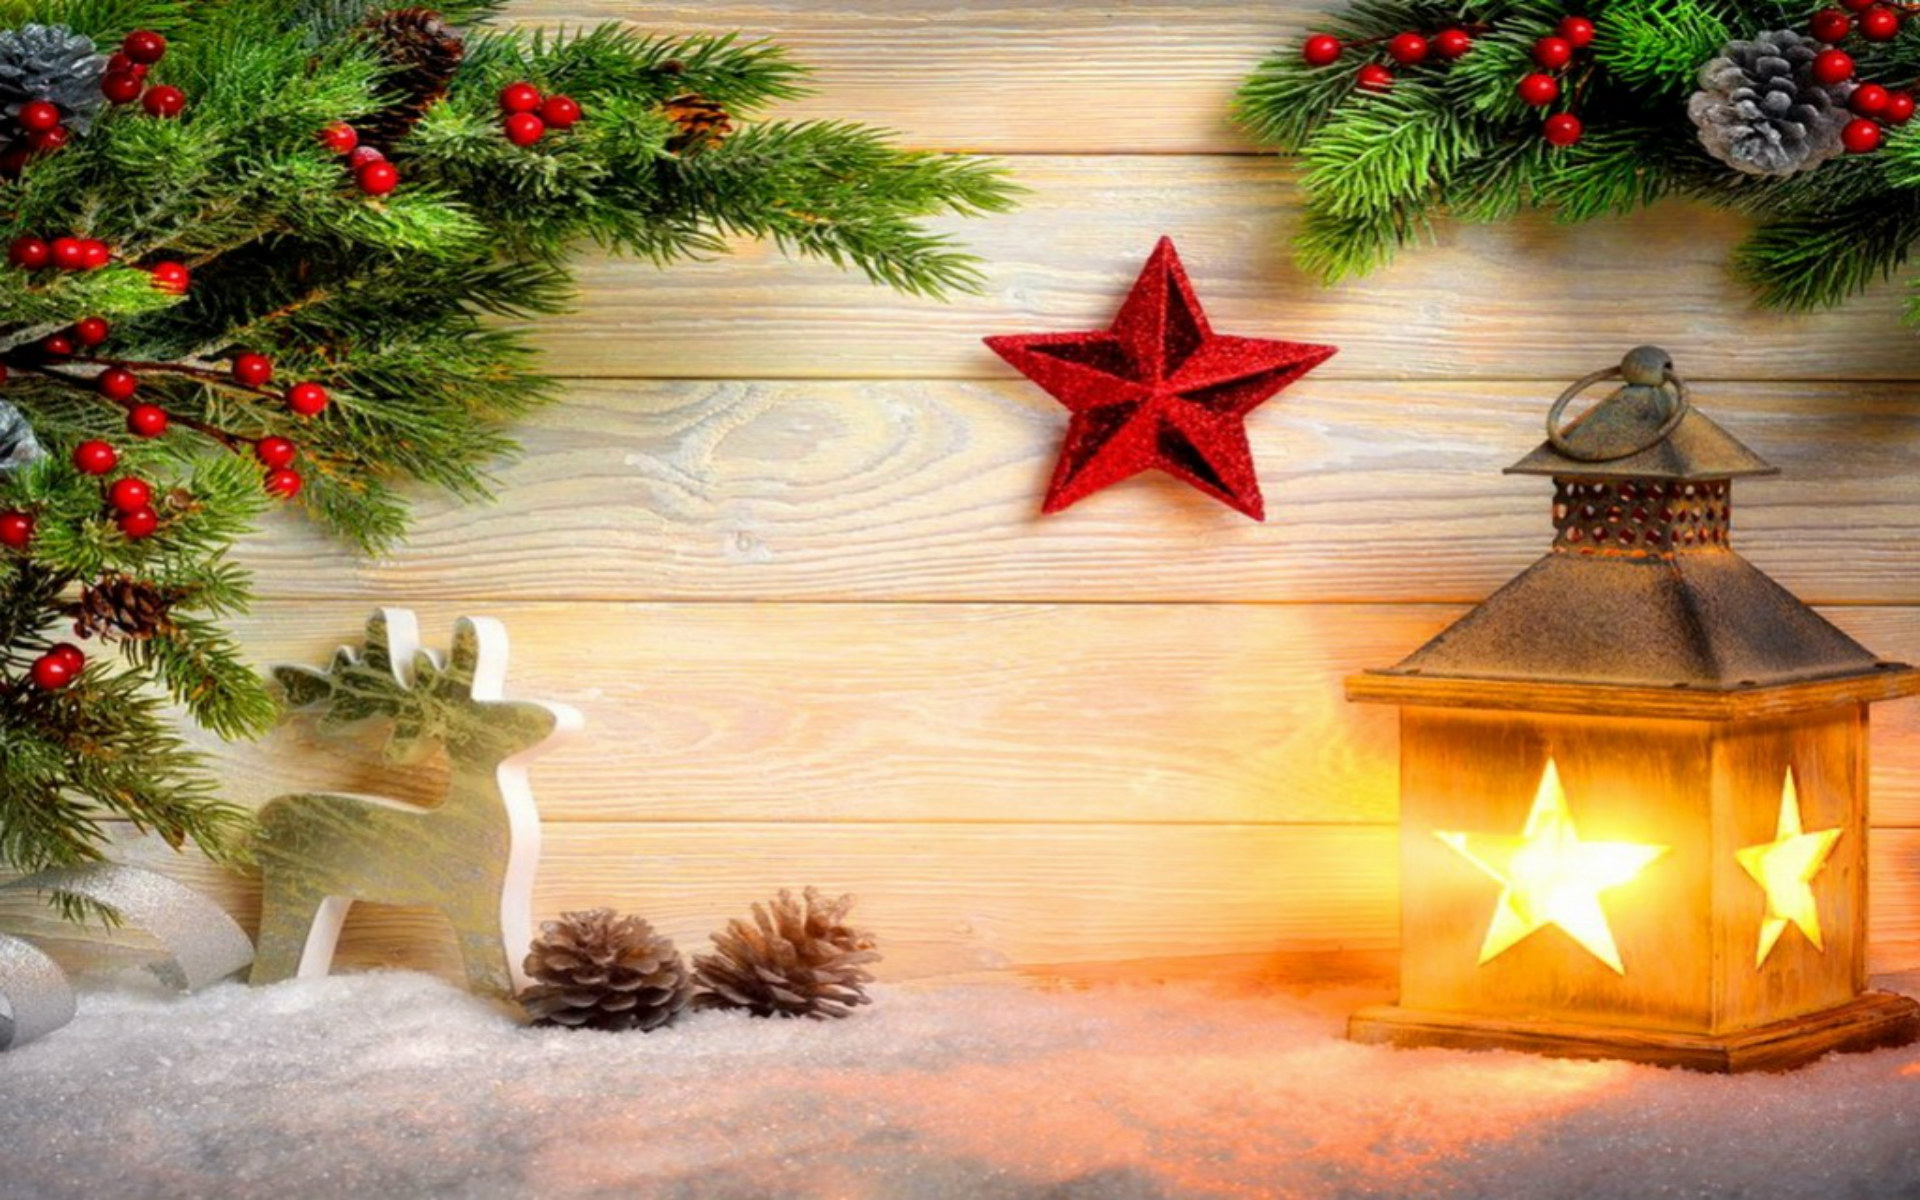 Old Fashioned Christmas Wallpaper - WallpaperSafari